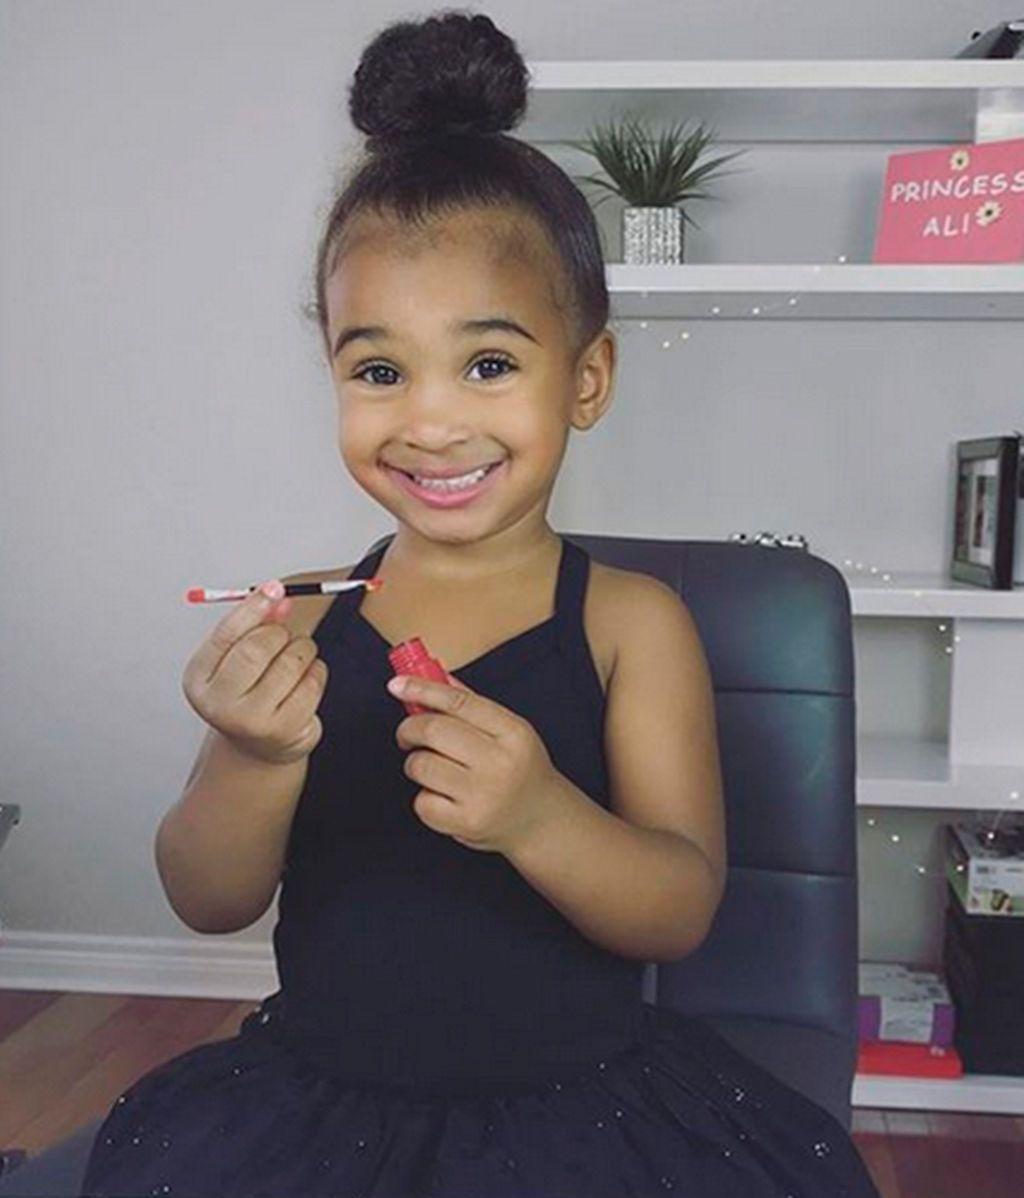 Samia Ali, la casi bebé instagramer a la que sigue hasta Rihanna